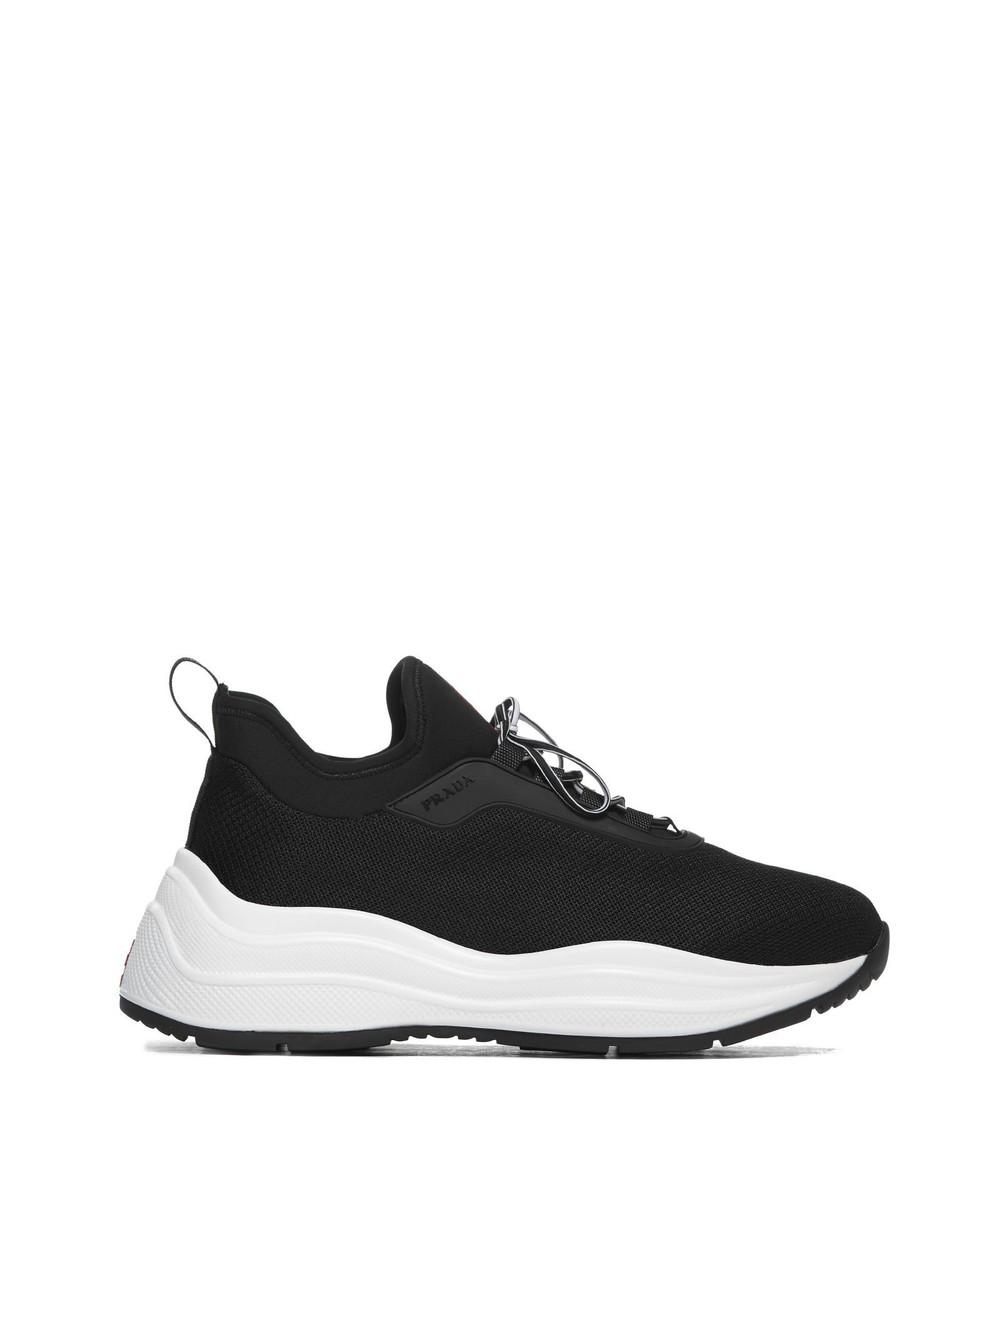 Prada Linea Rossa Lace-up Sneakers in nero